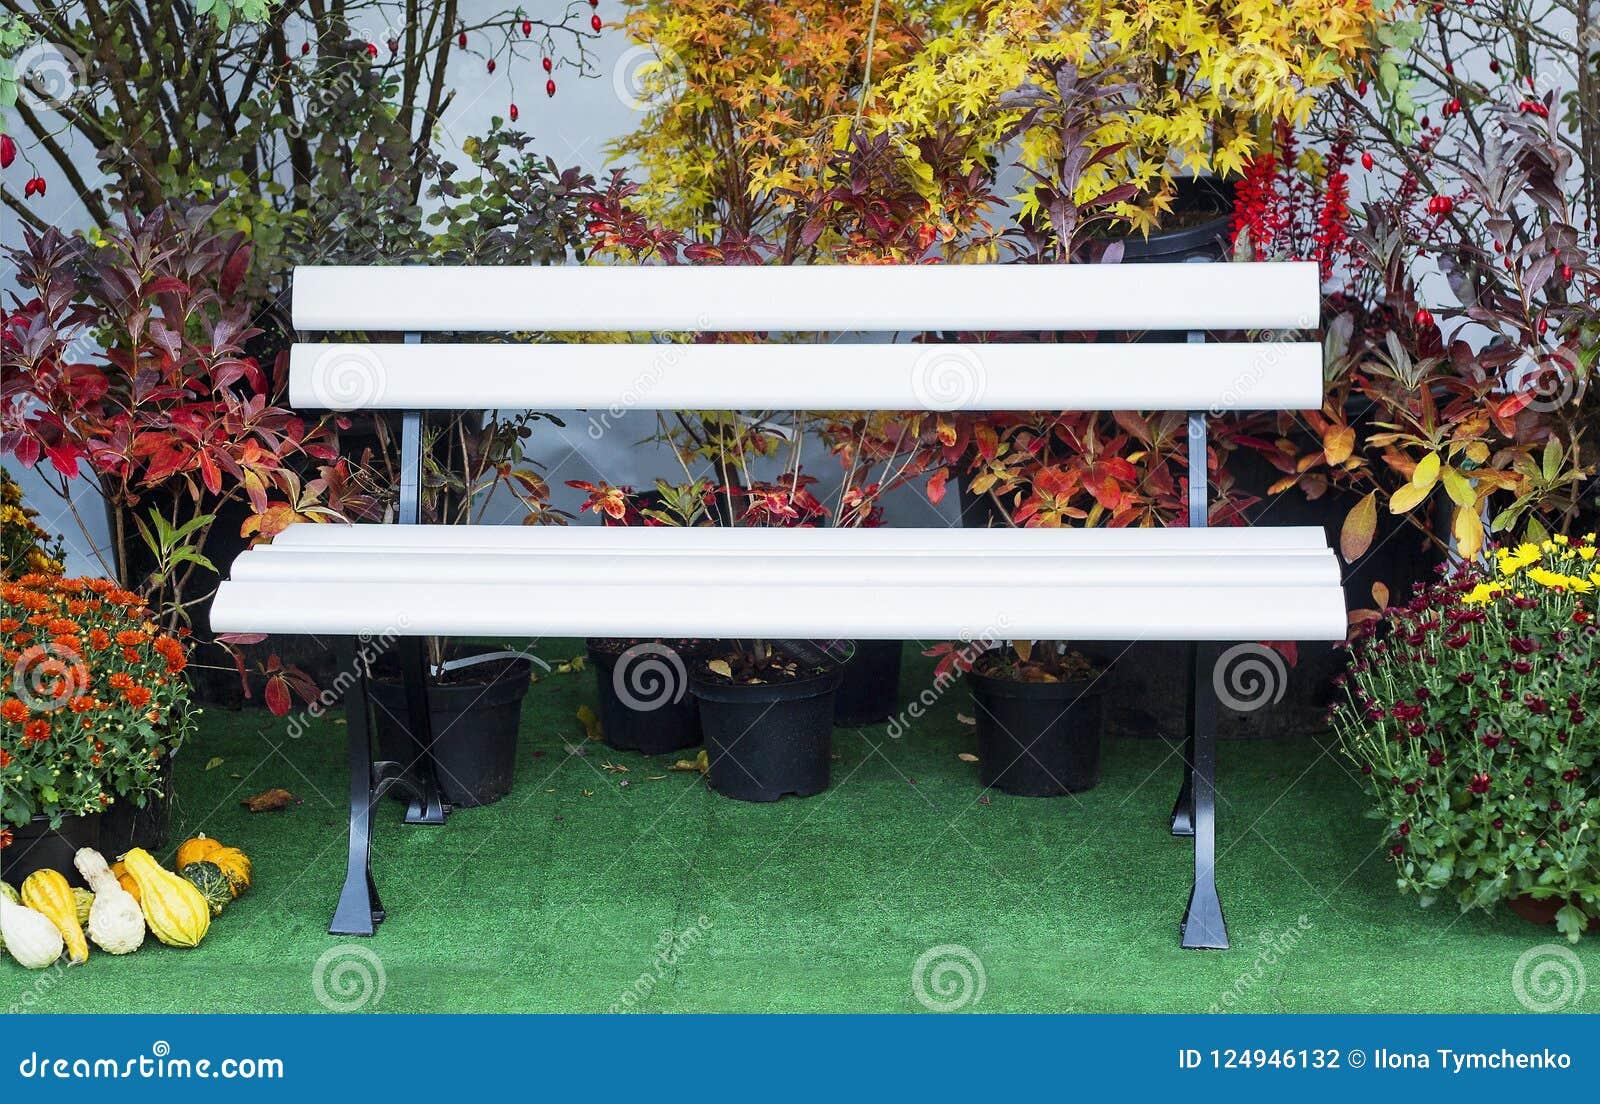 White Wooden Bench In Autumn Garden Near House Stock Photo Image Of Chrysanthemum Falling 124946132